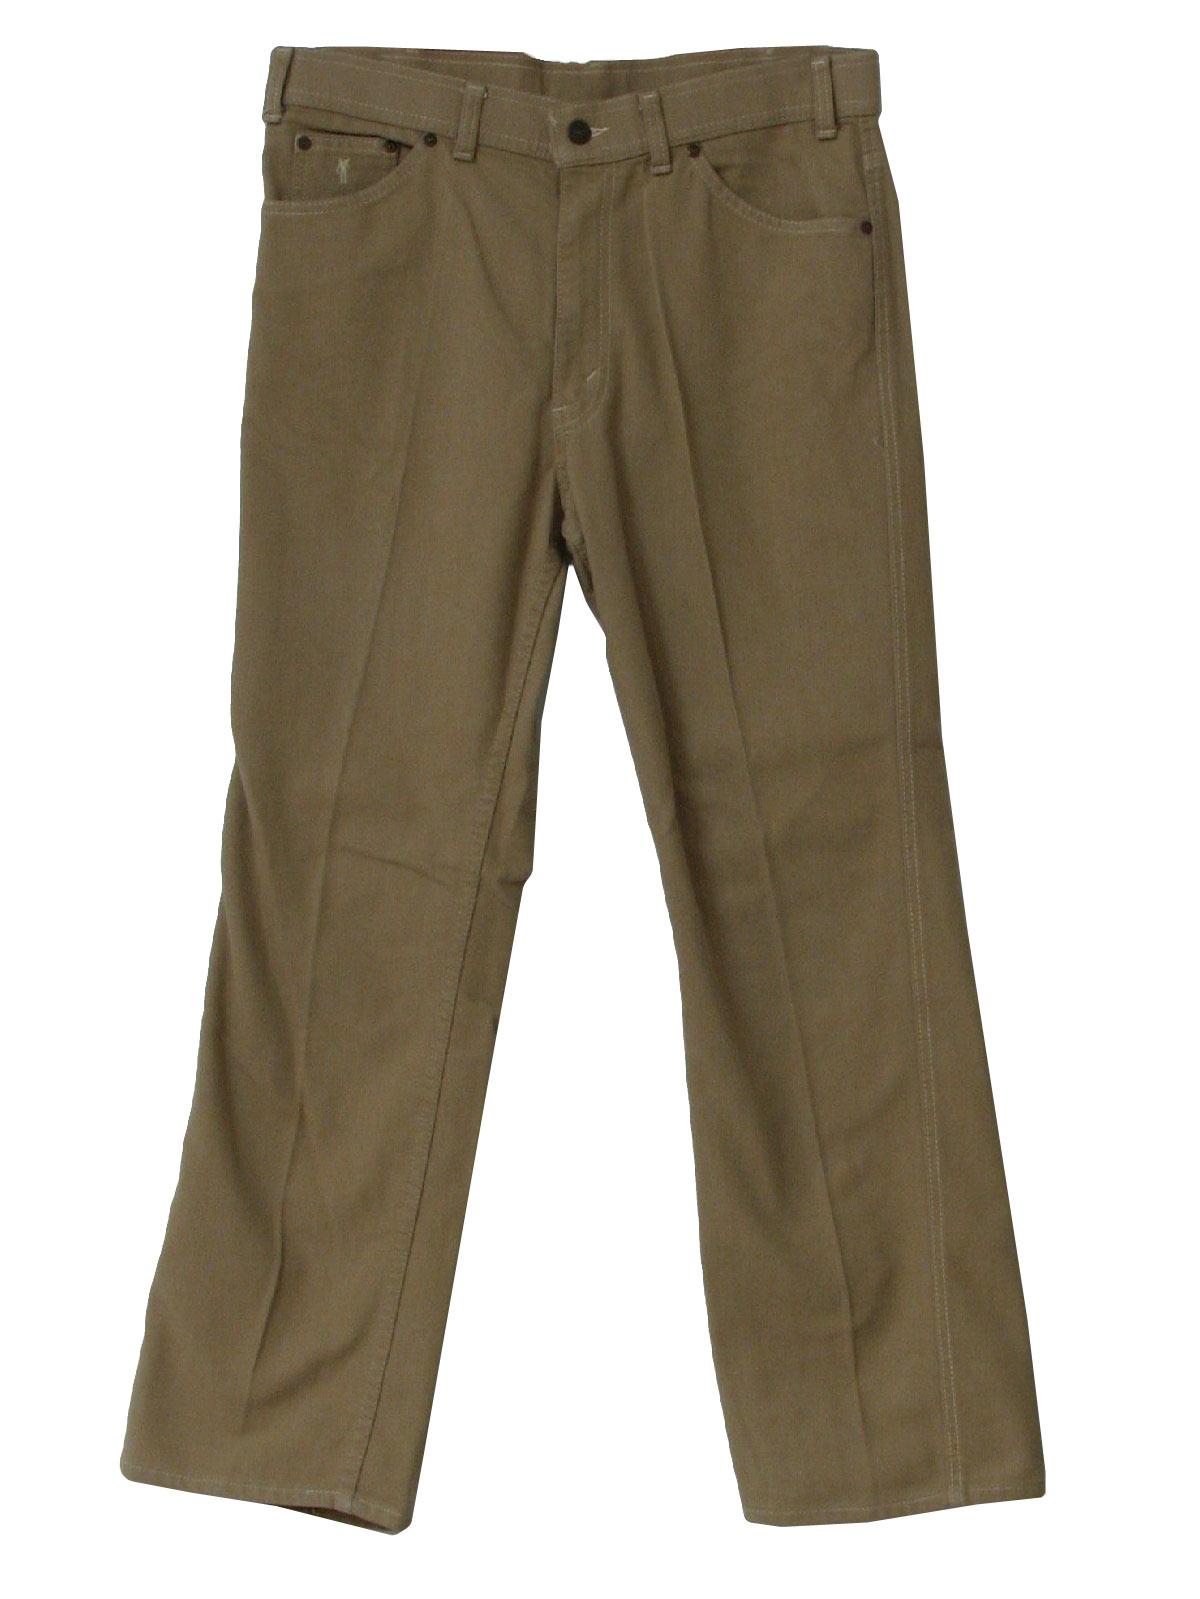 1970 s levis for men mens flared jeans pants late 70s levis for men